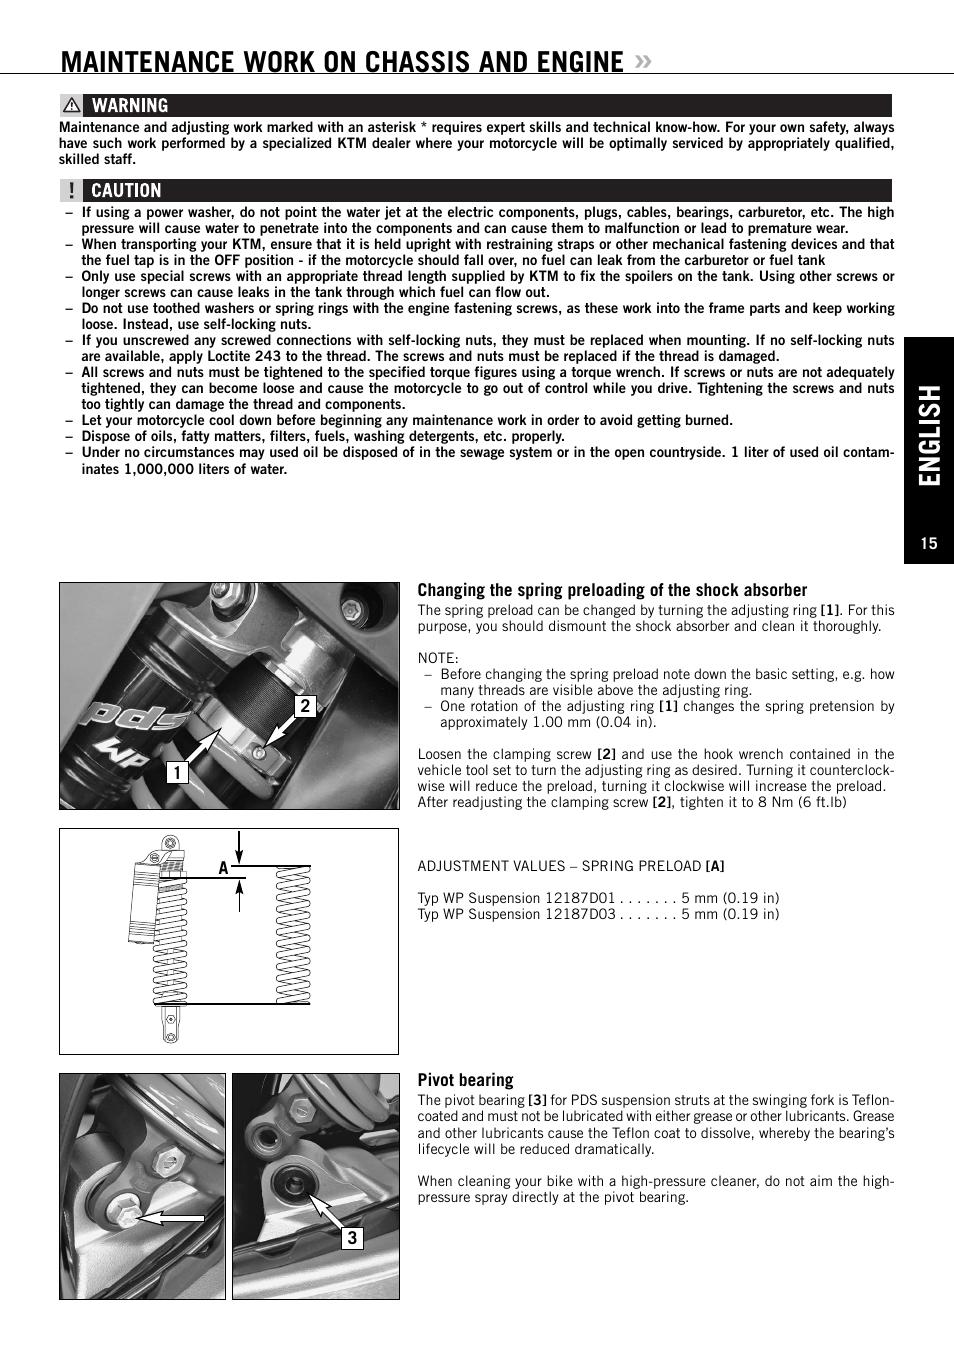 english maintenance work on chassis and engine ktm 144 sx user rh manualsdir com ktm 690 user manual ktm instruction manual